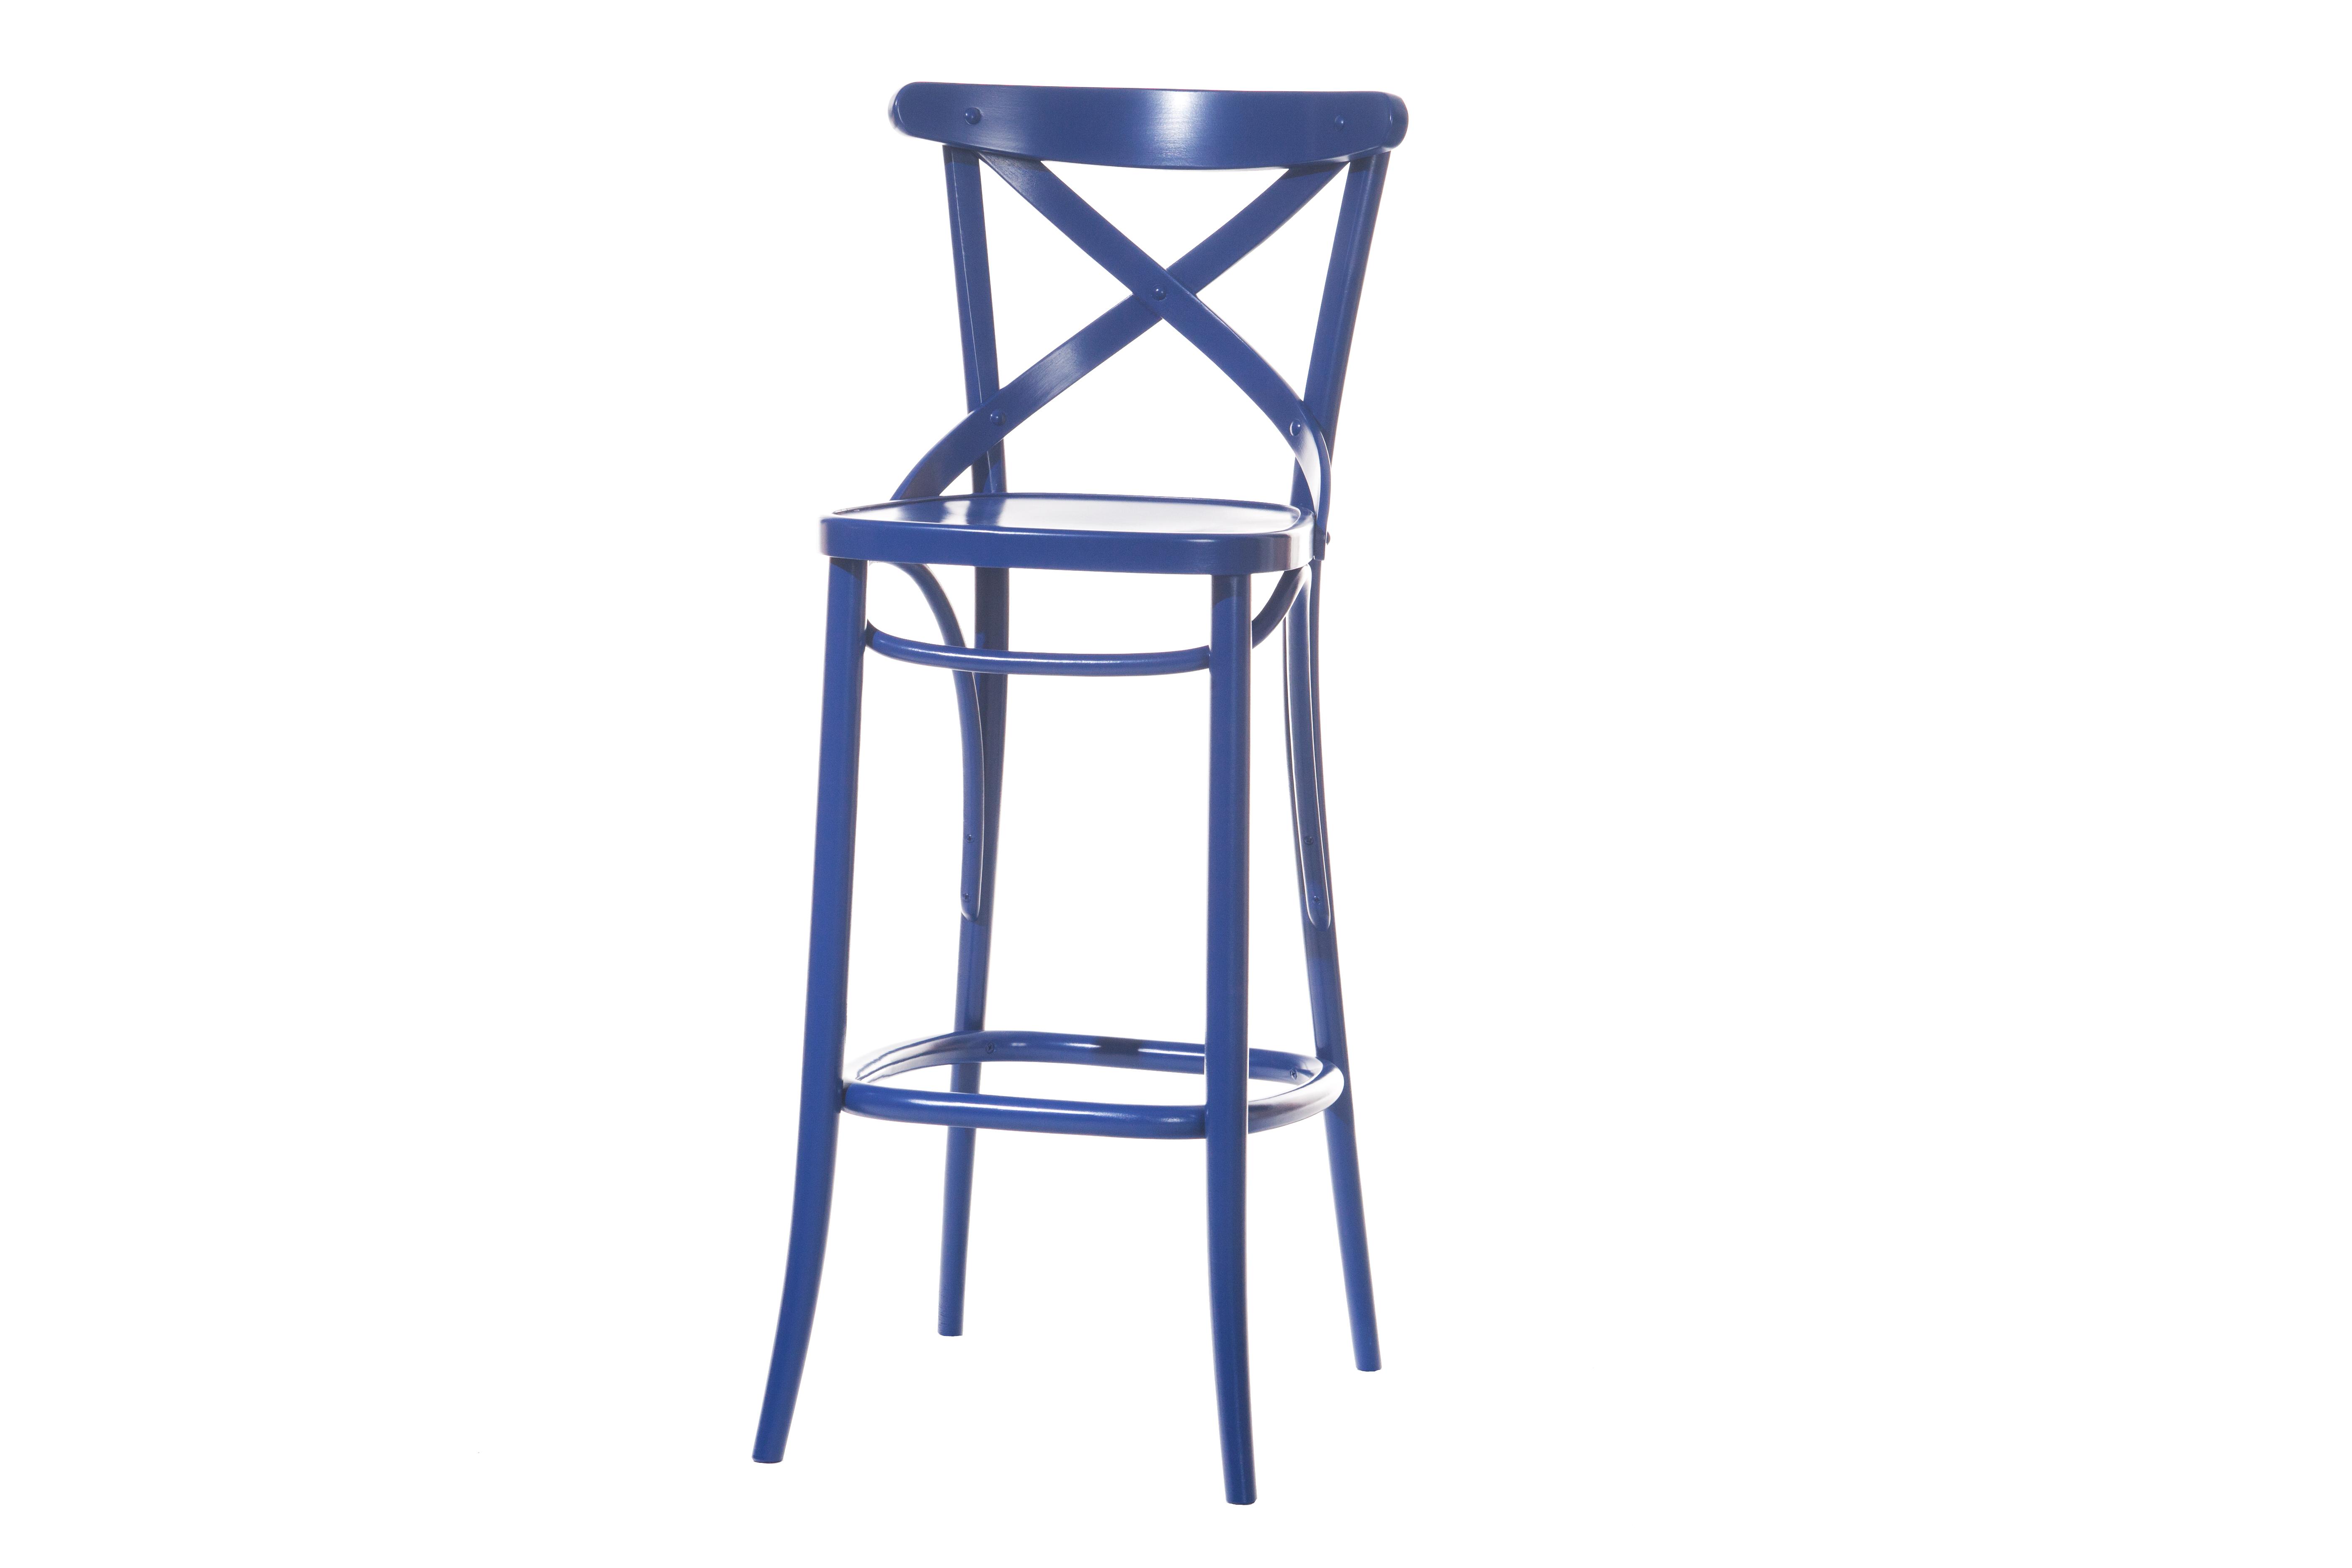 Scaun de bar din lemn de fag 149 Blue, l45xA46,5xH109,5 cm imagine